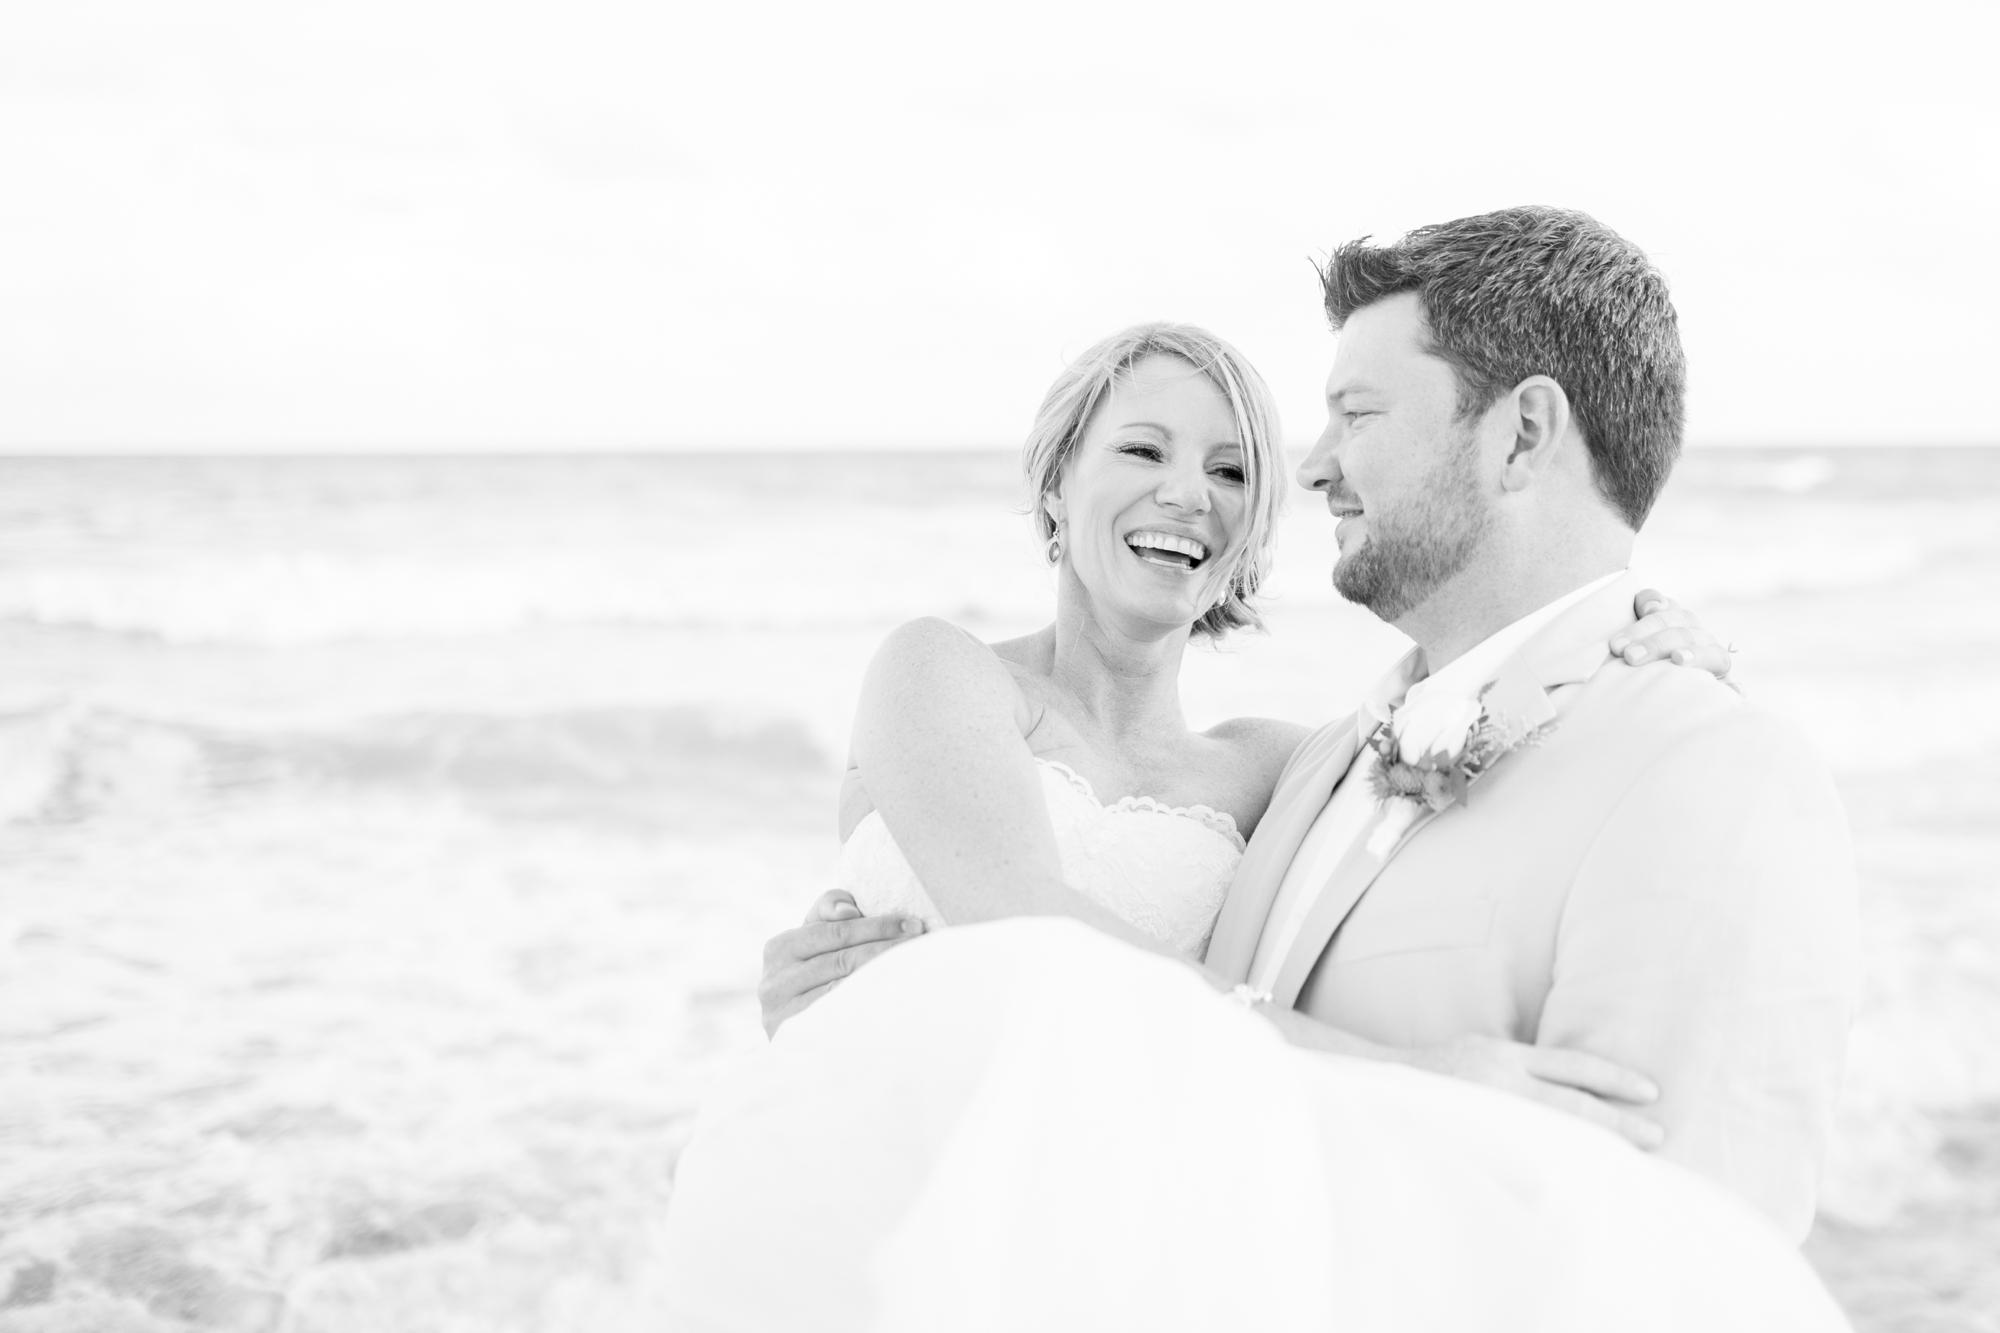 Morosoff Wedding 4-Bride & Groom Portraits-424_anna grace photography destination wedding photographer playa del carmen mexico photo.jpg